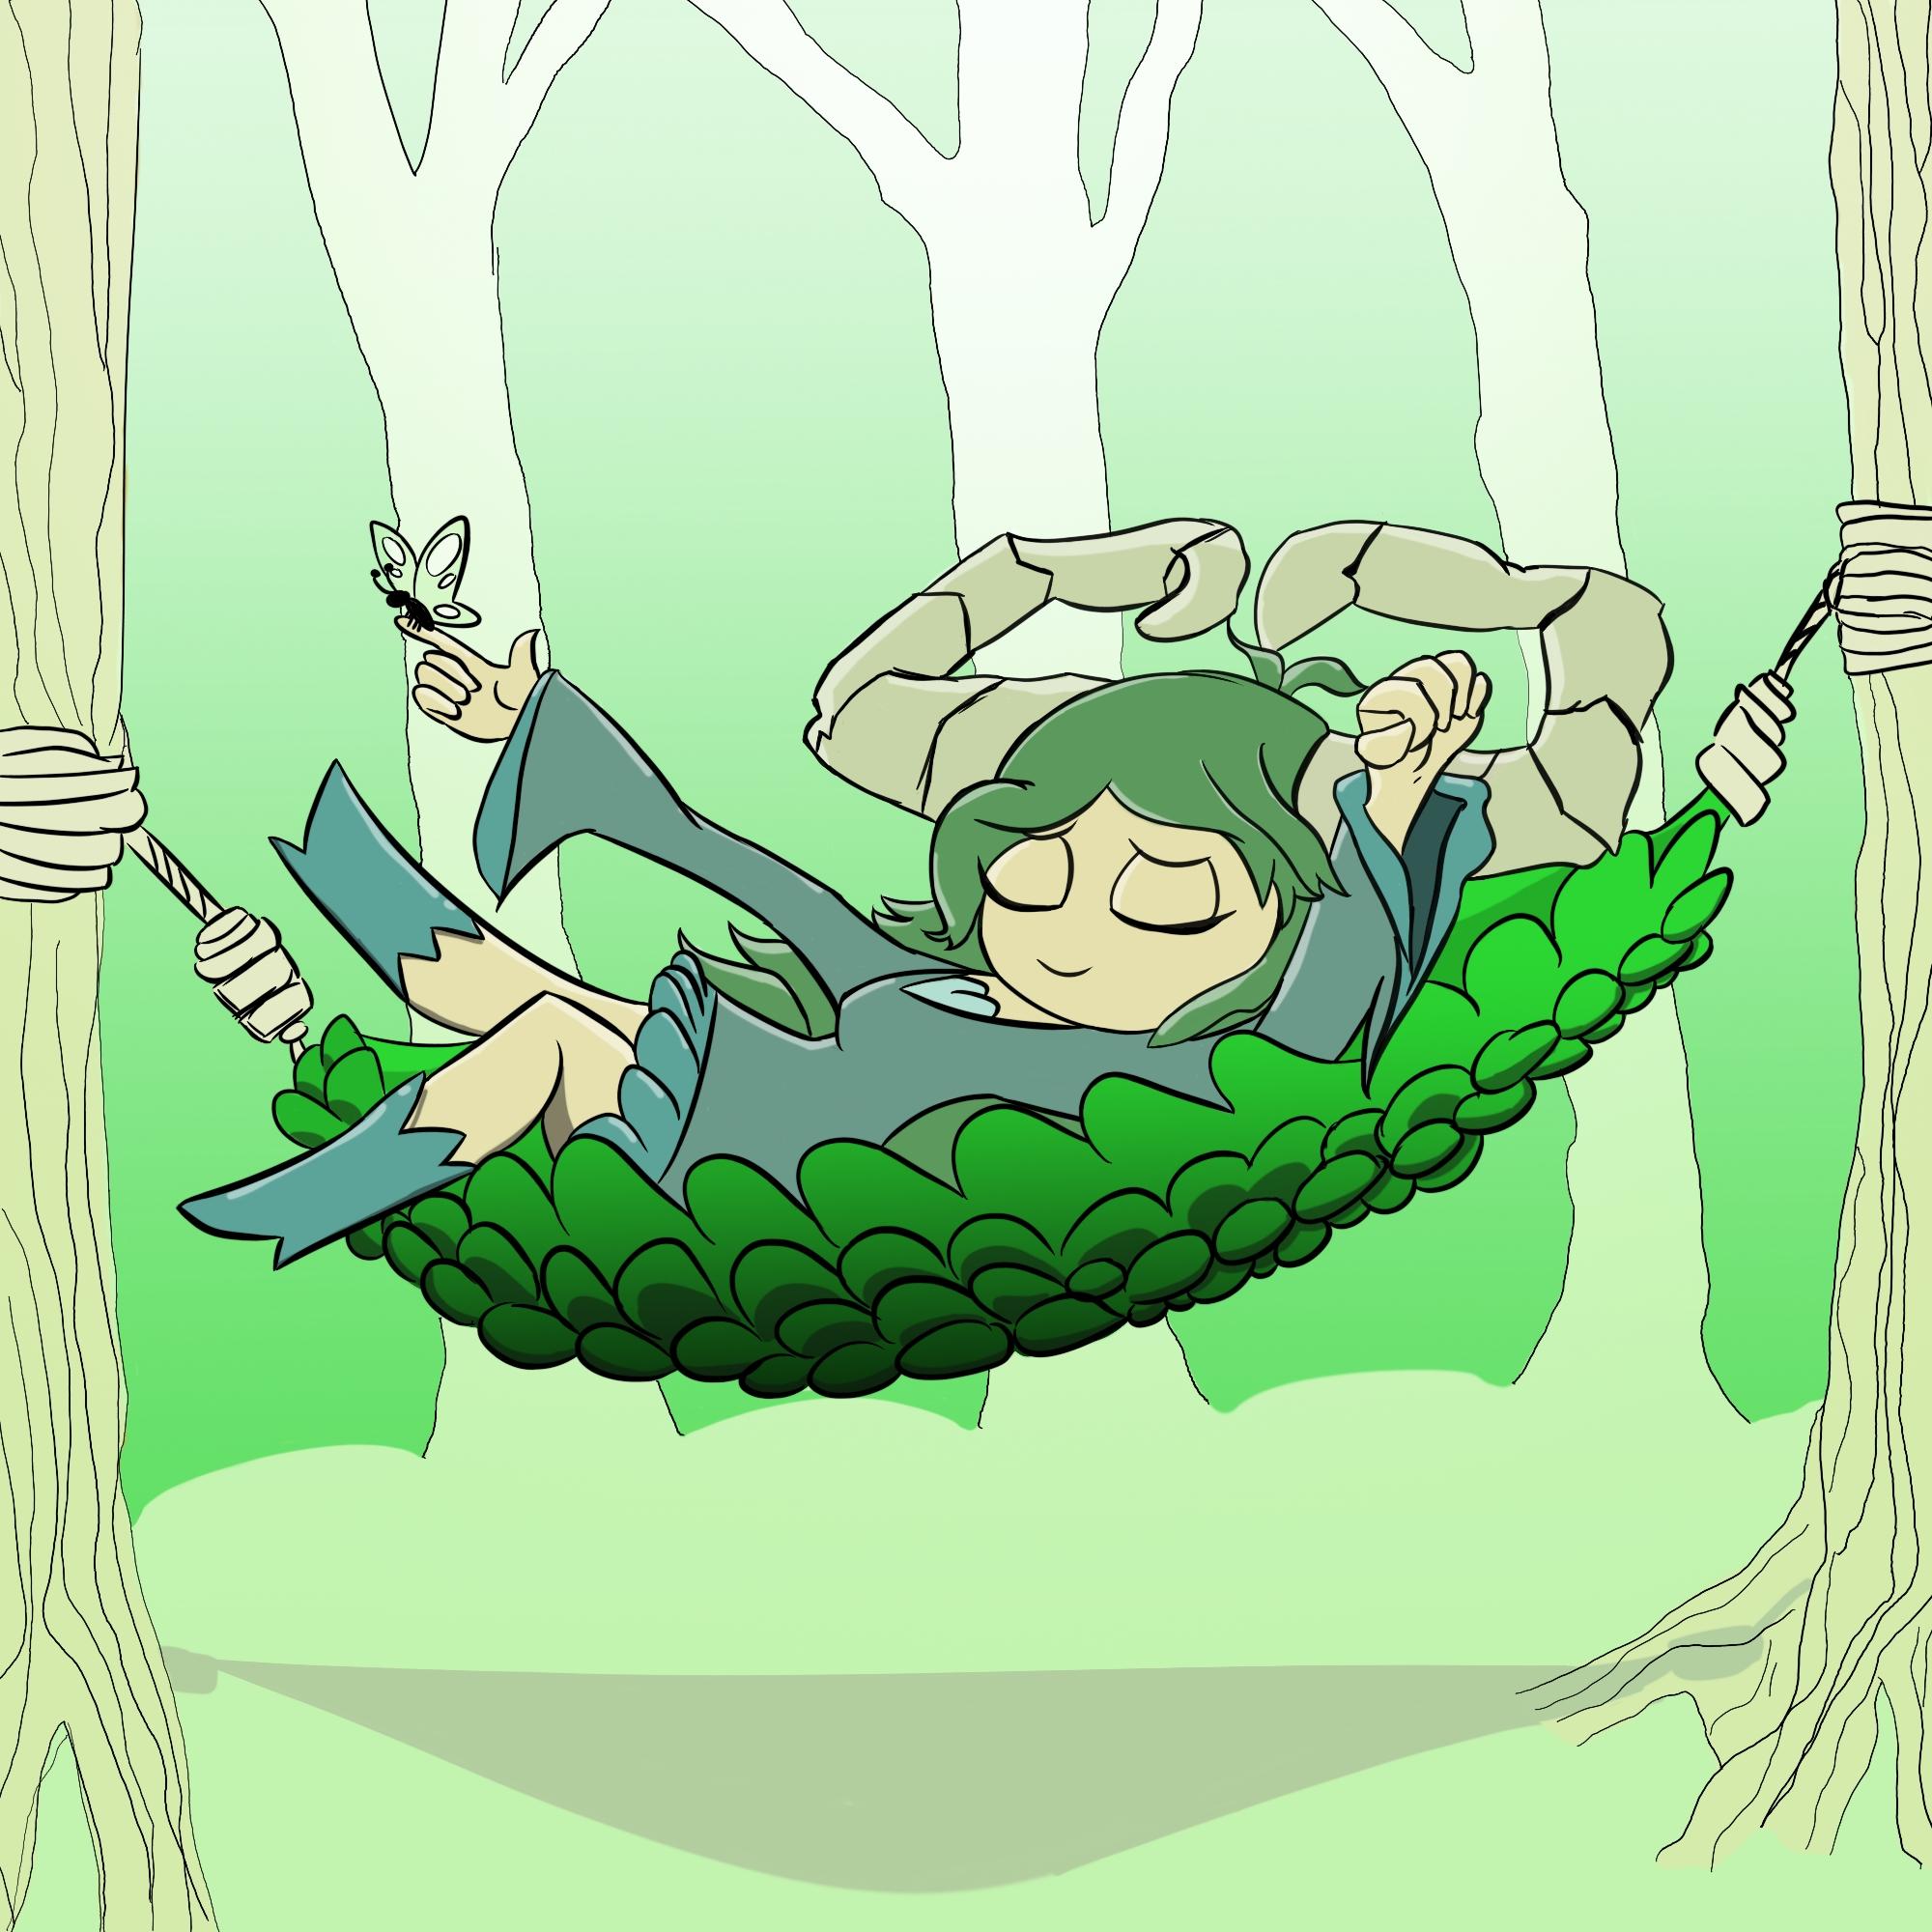 OC Request - Leaf The Grass Dragon